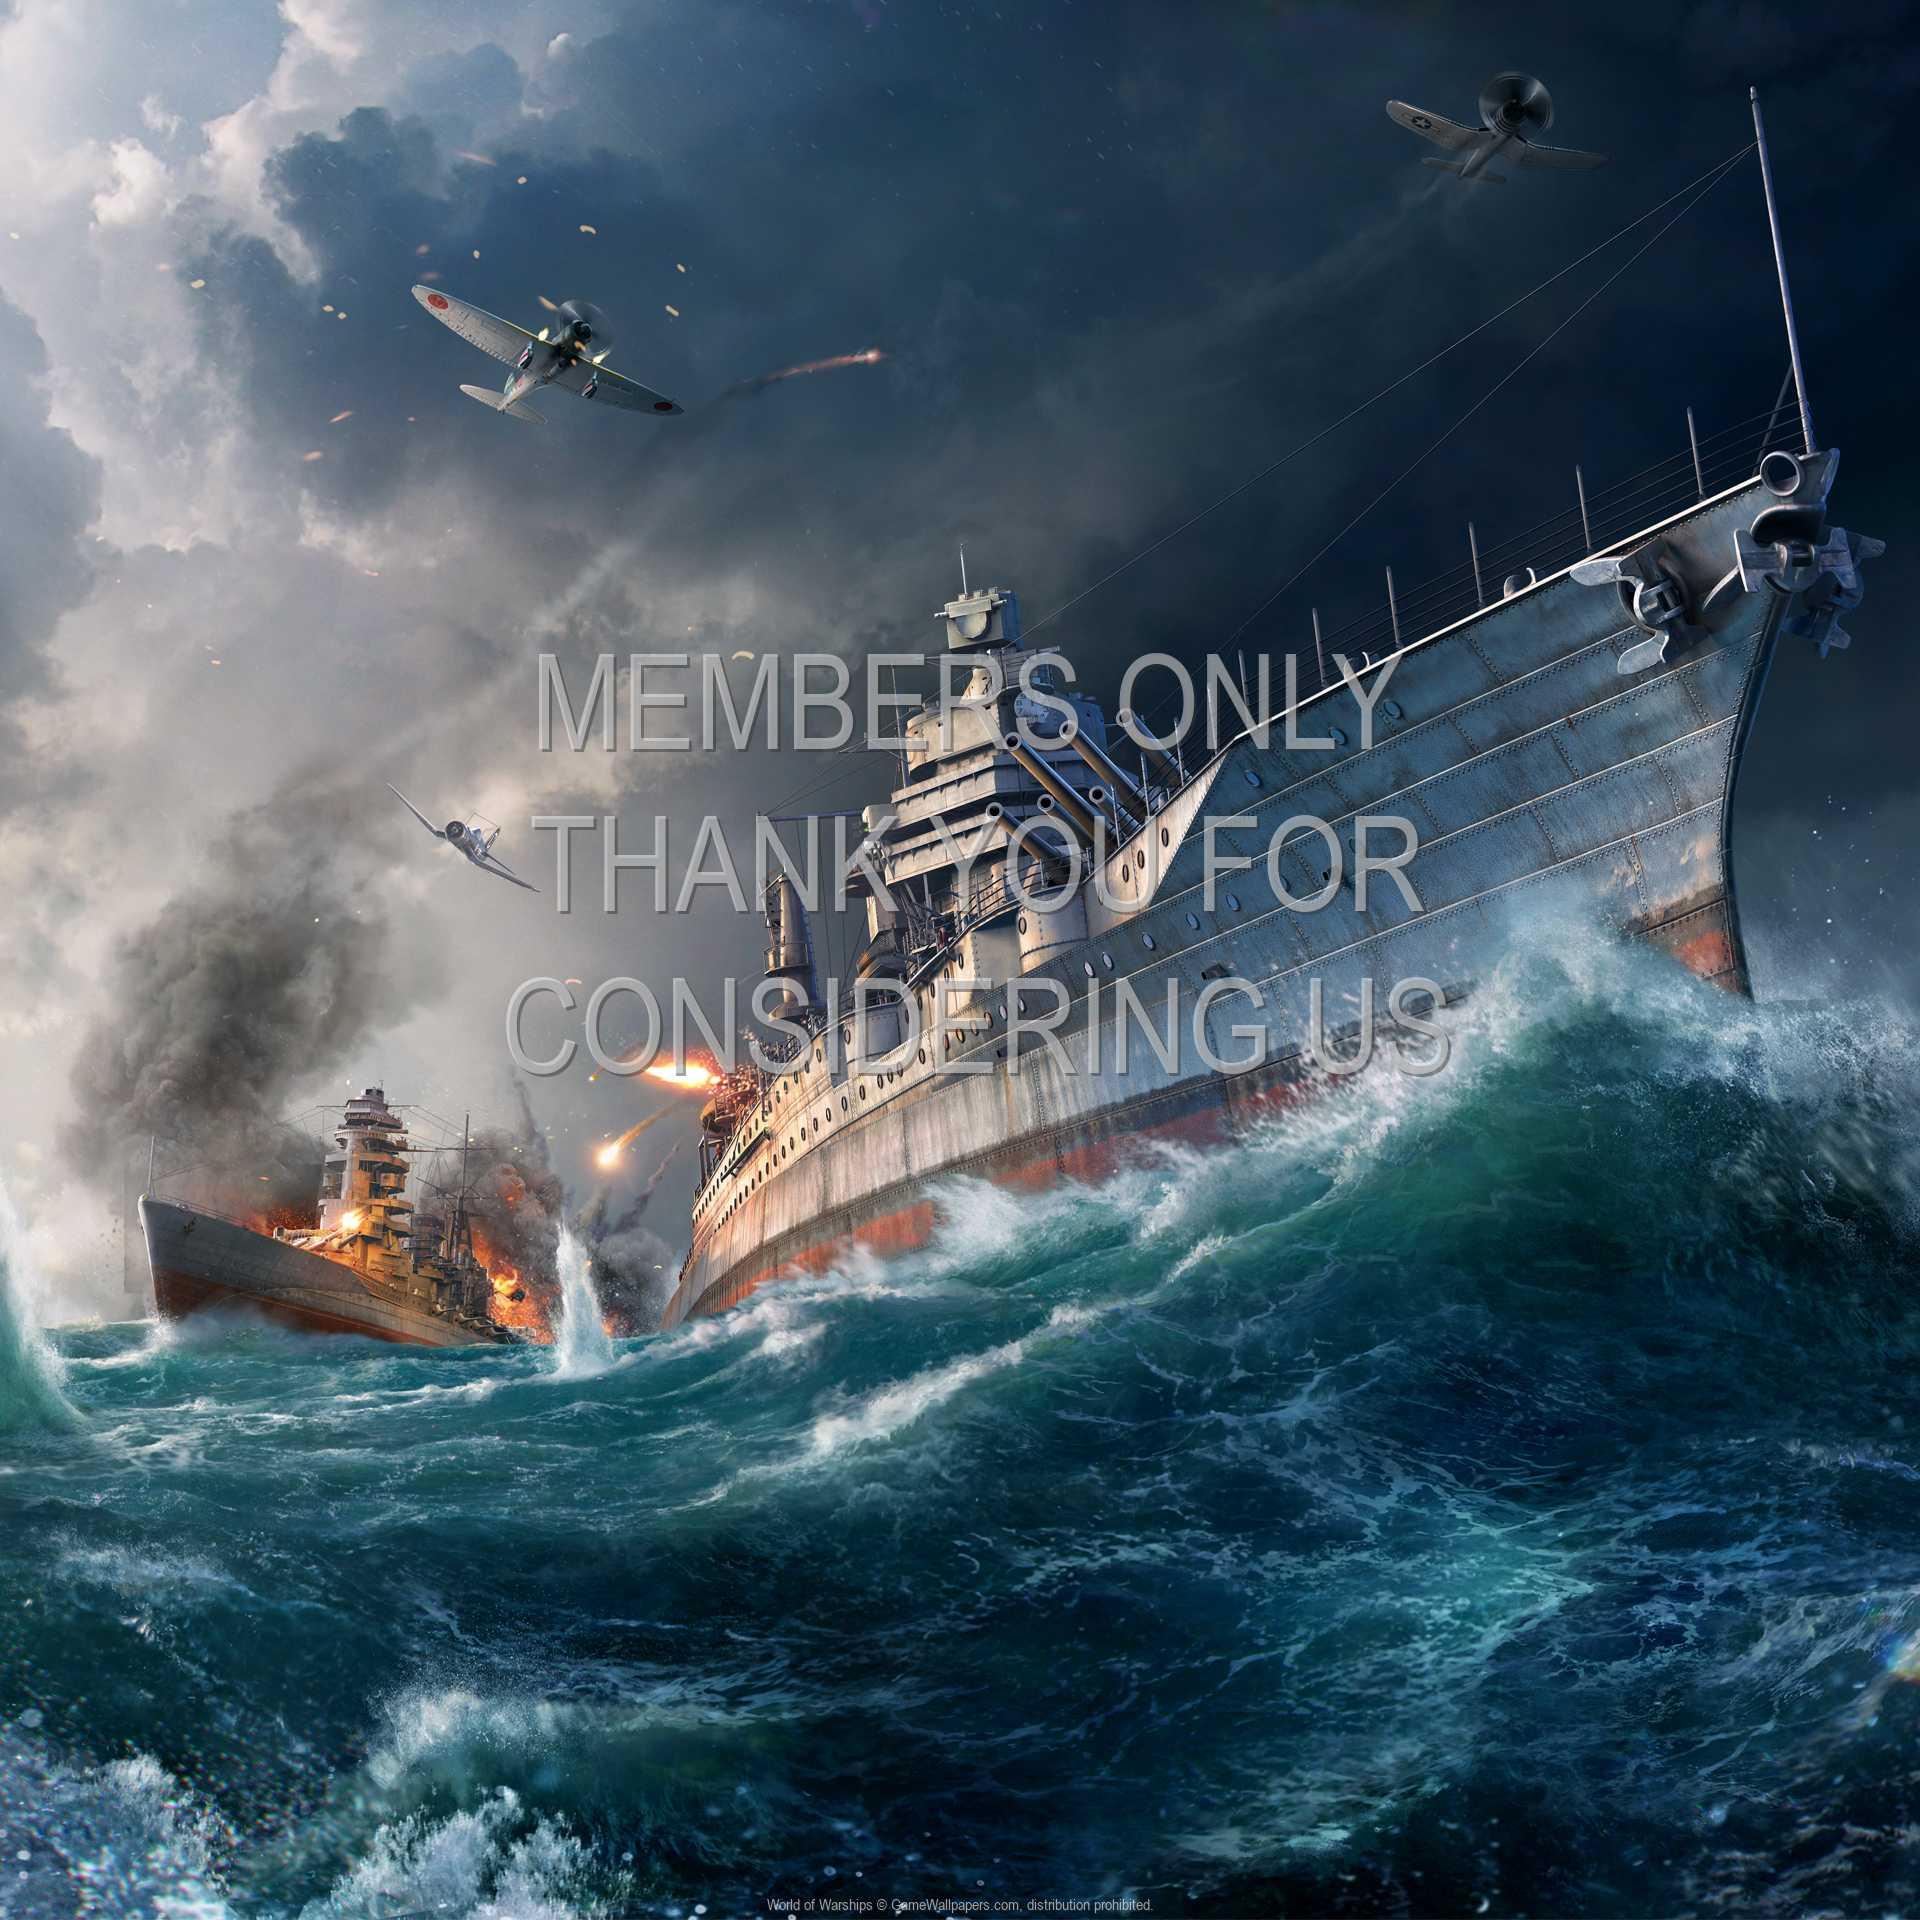 World of Warships 1080p Horizontal Mobile wallpaper or background 05